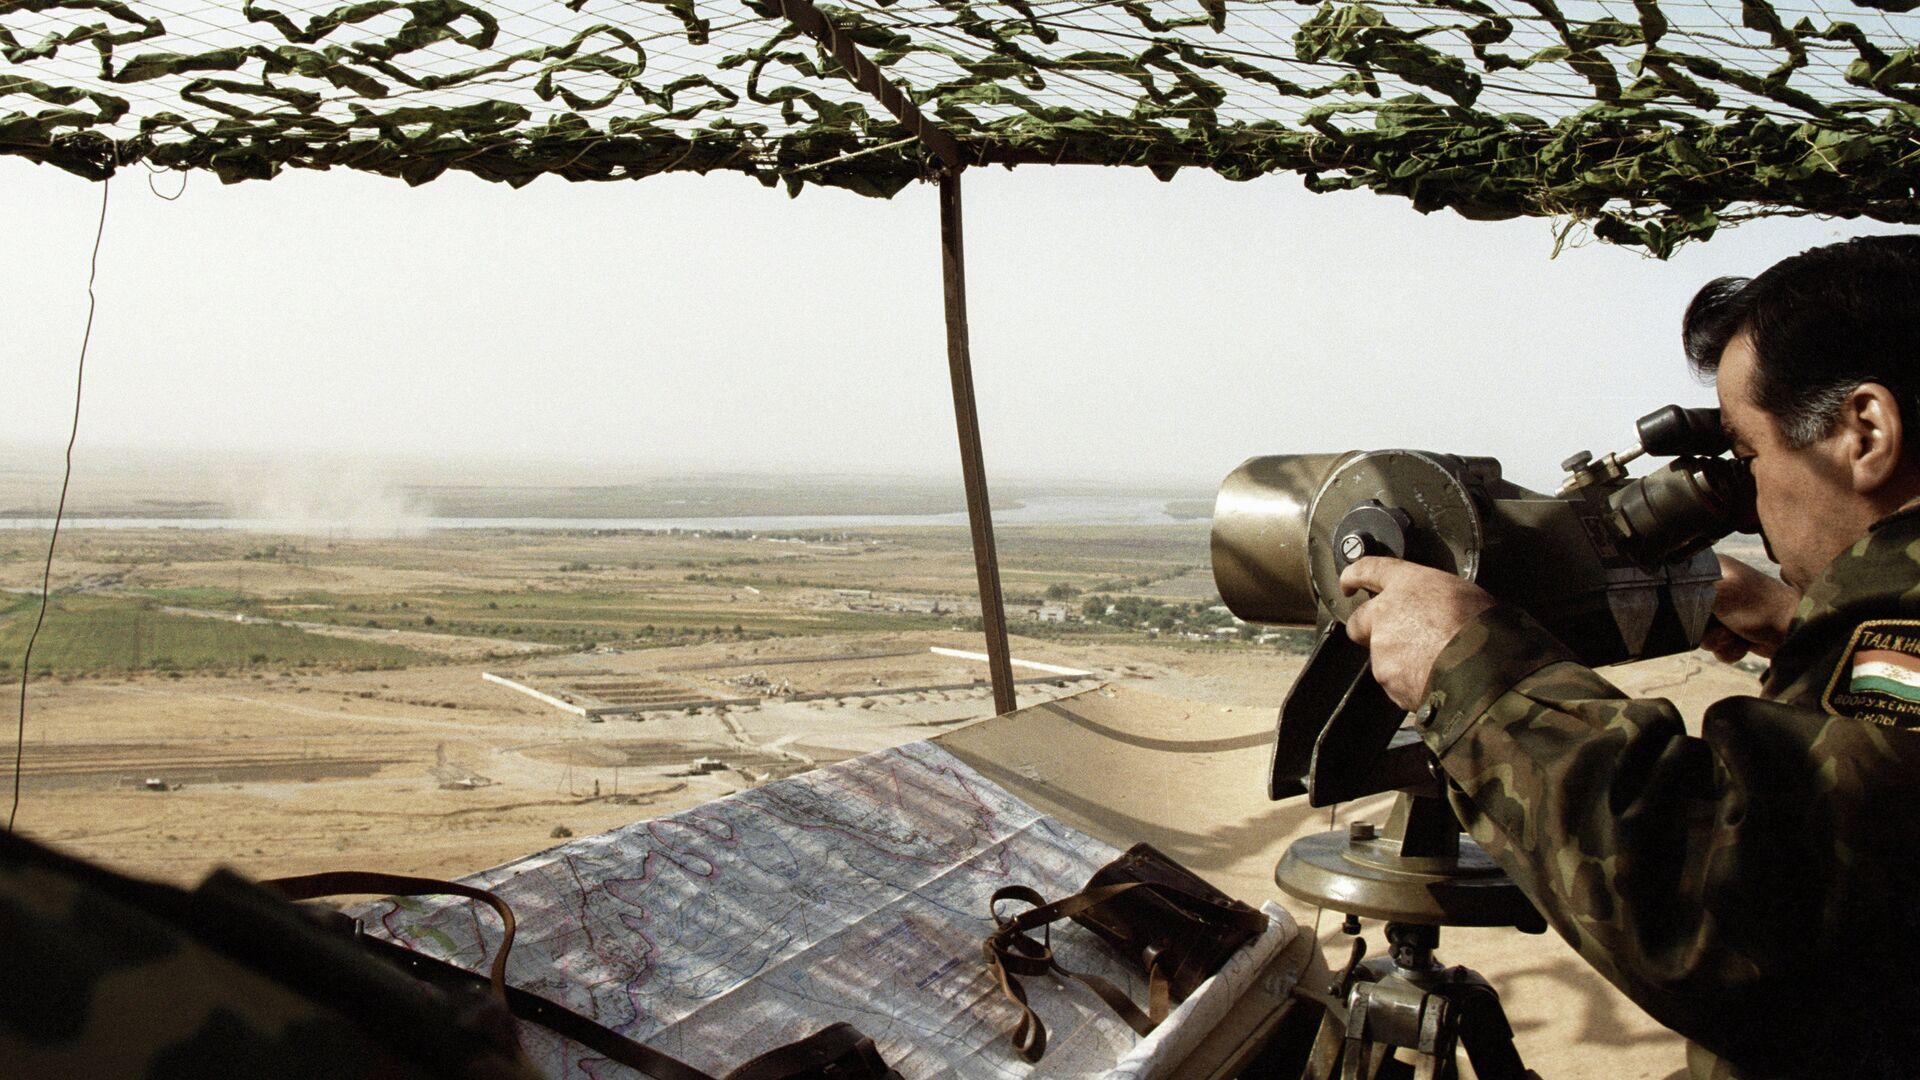 Граница Таджикистана с Афганистаном, архивное фото - Sputnik Тоҷикистон, 1920, 25.07.2021